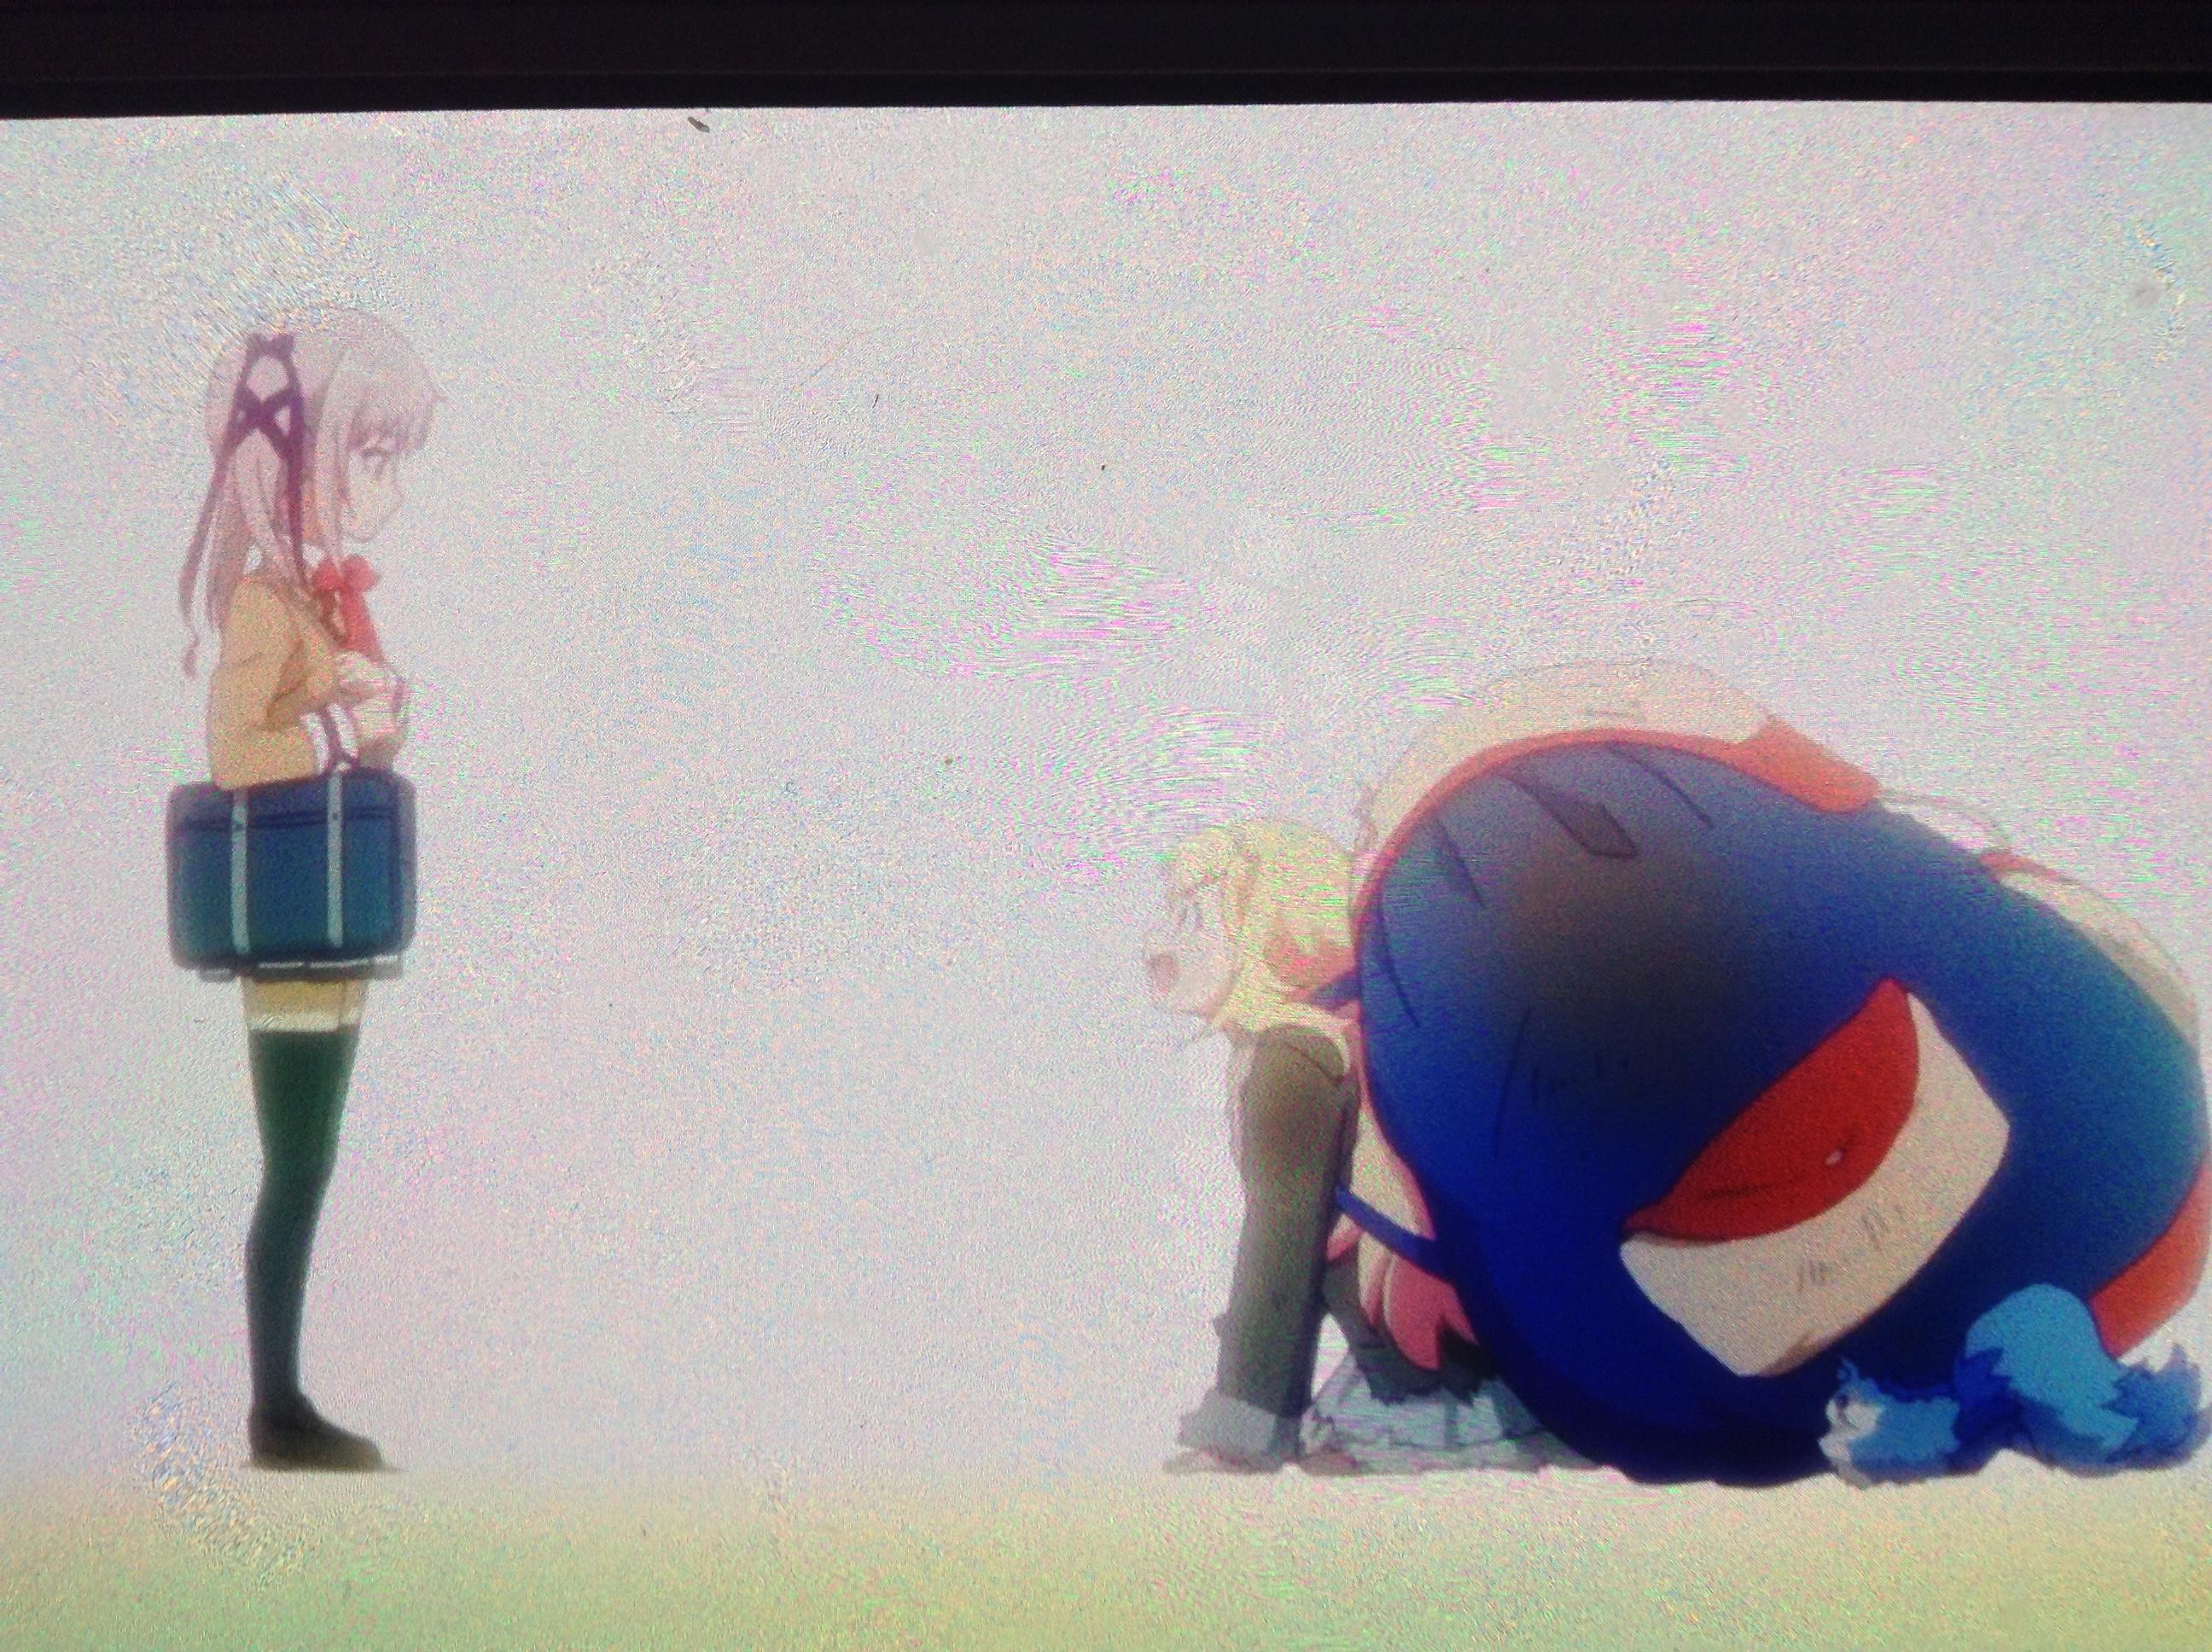 Anime Stomach Growl Sound 13/Image Gallery